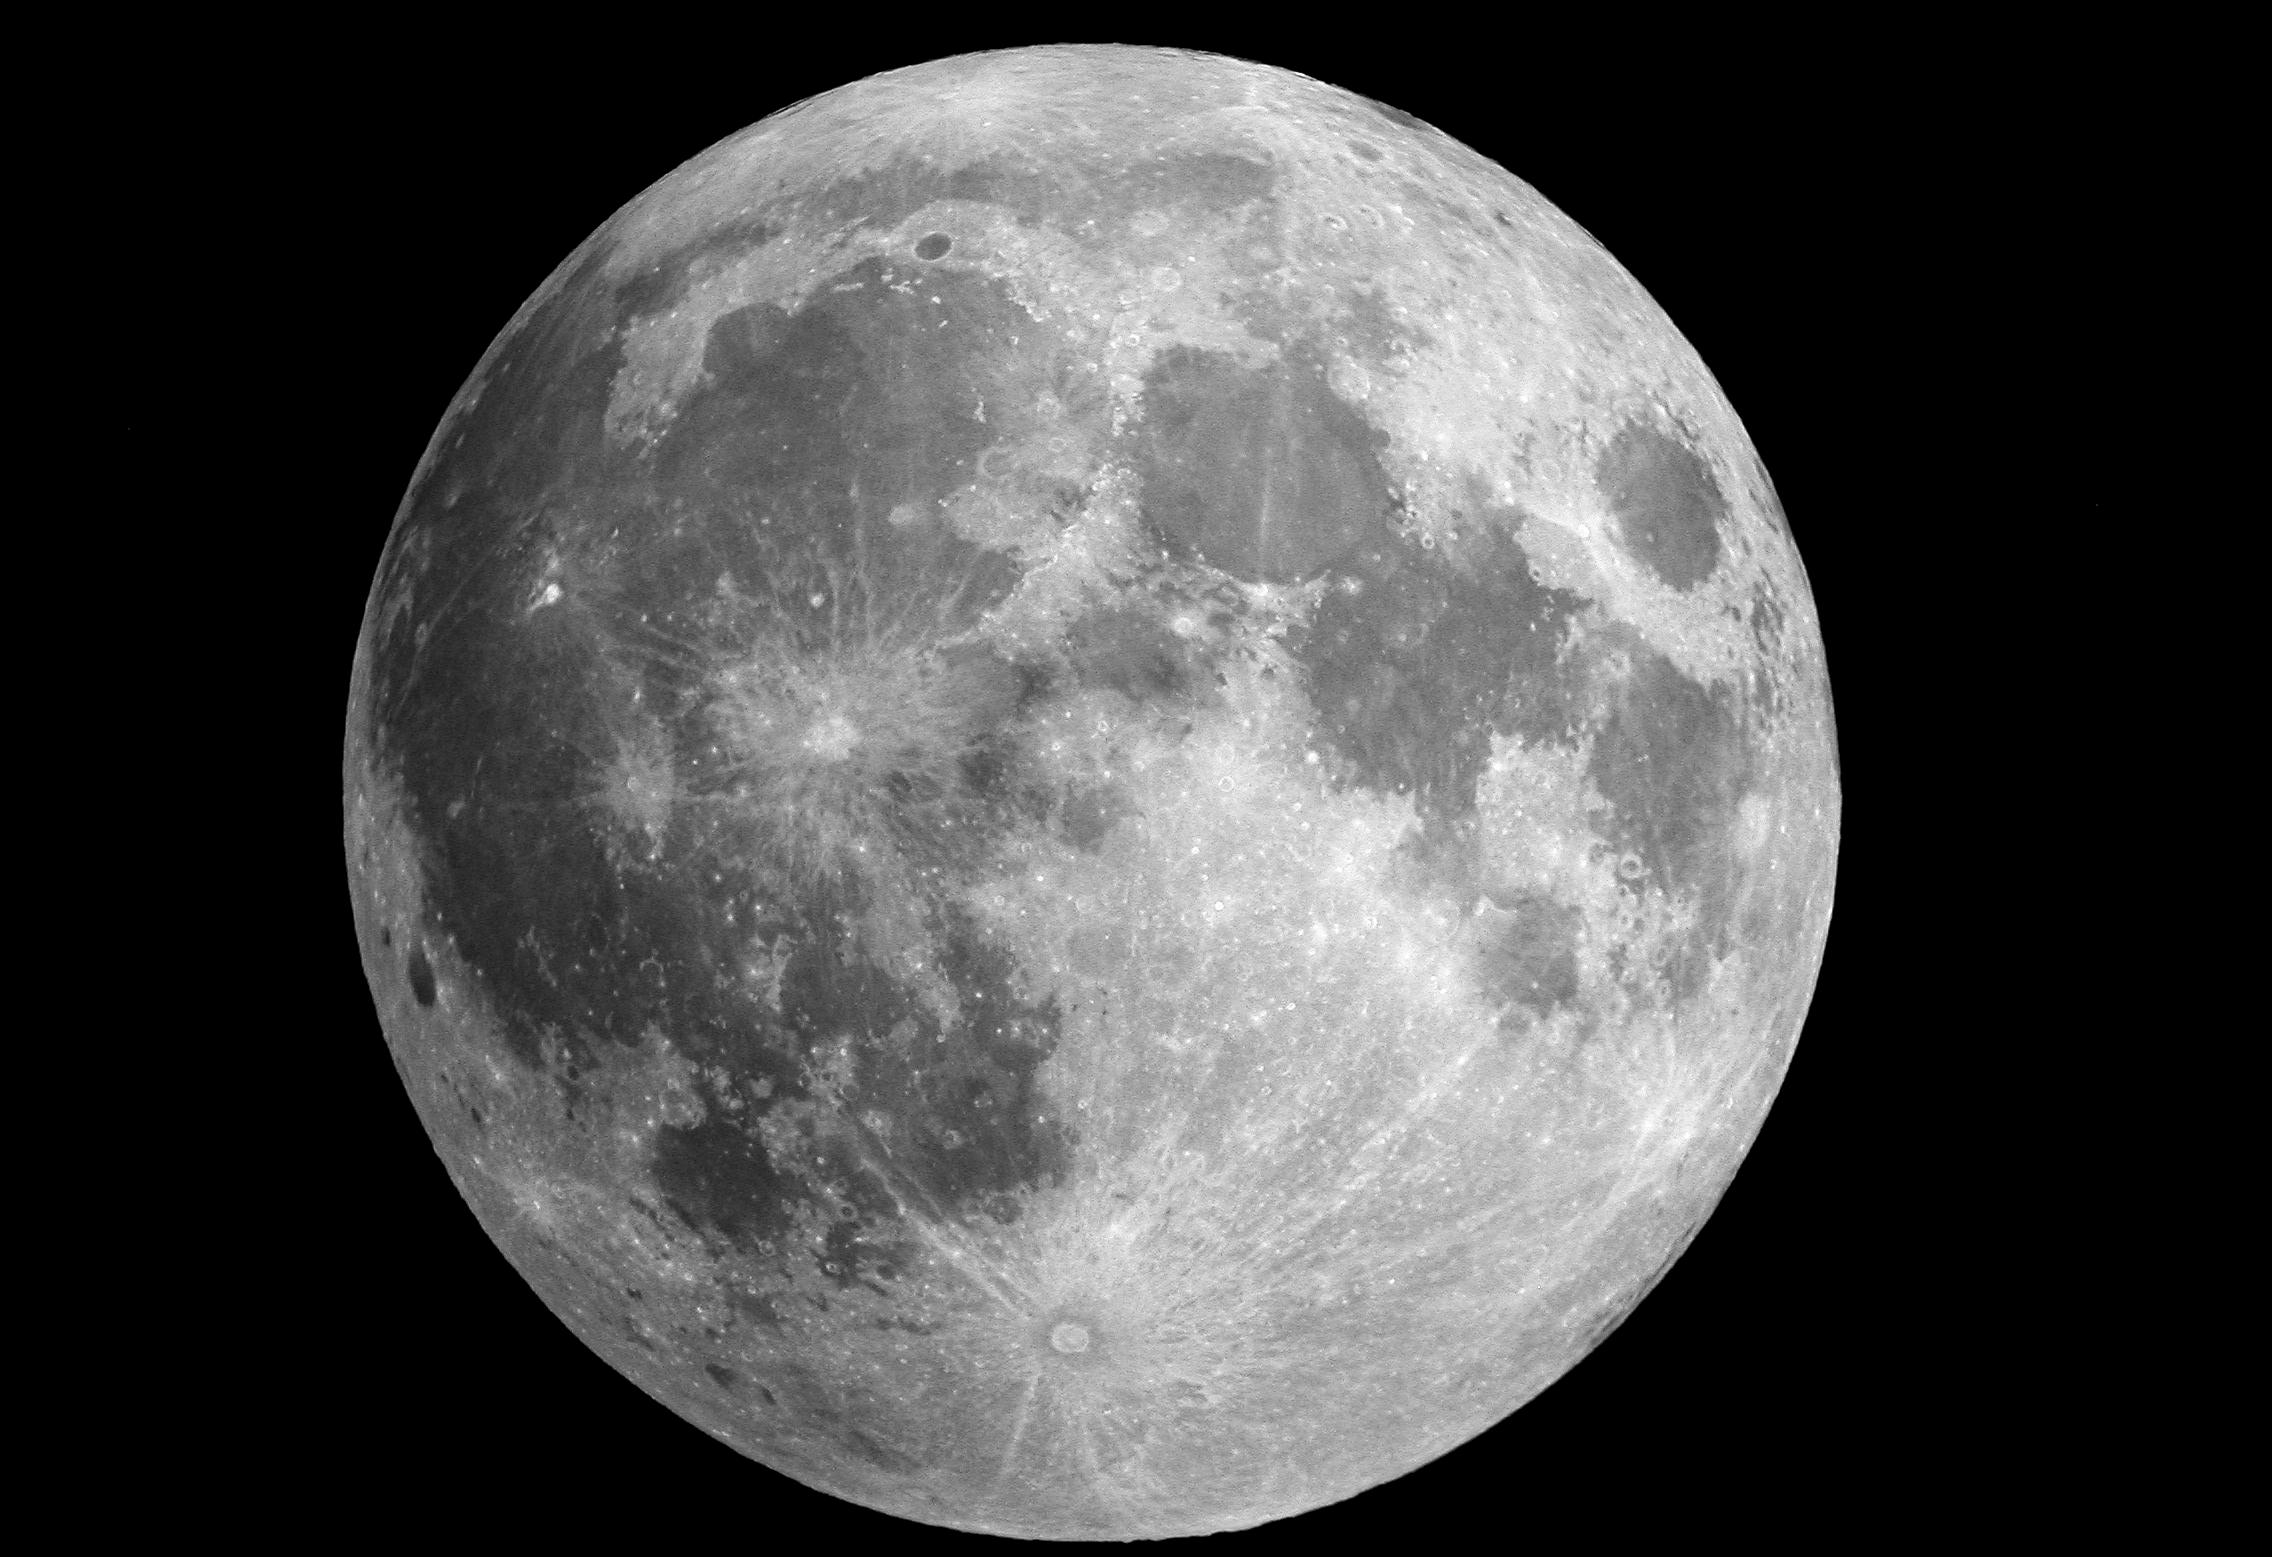 Full moon Lunar phase Clip art.